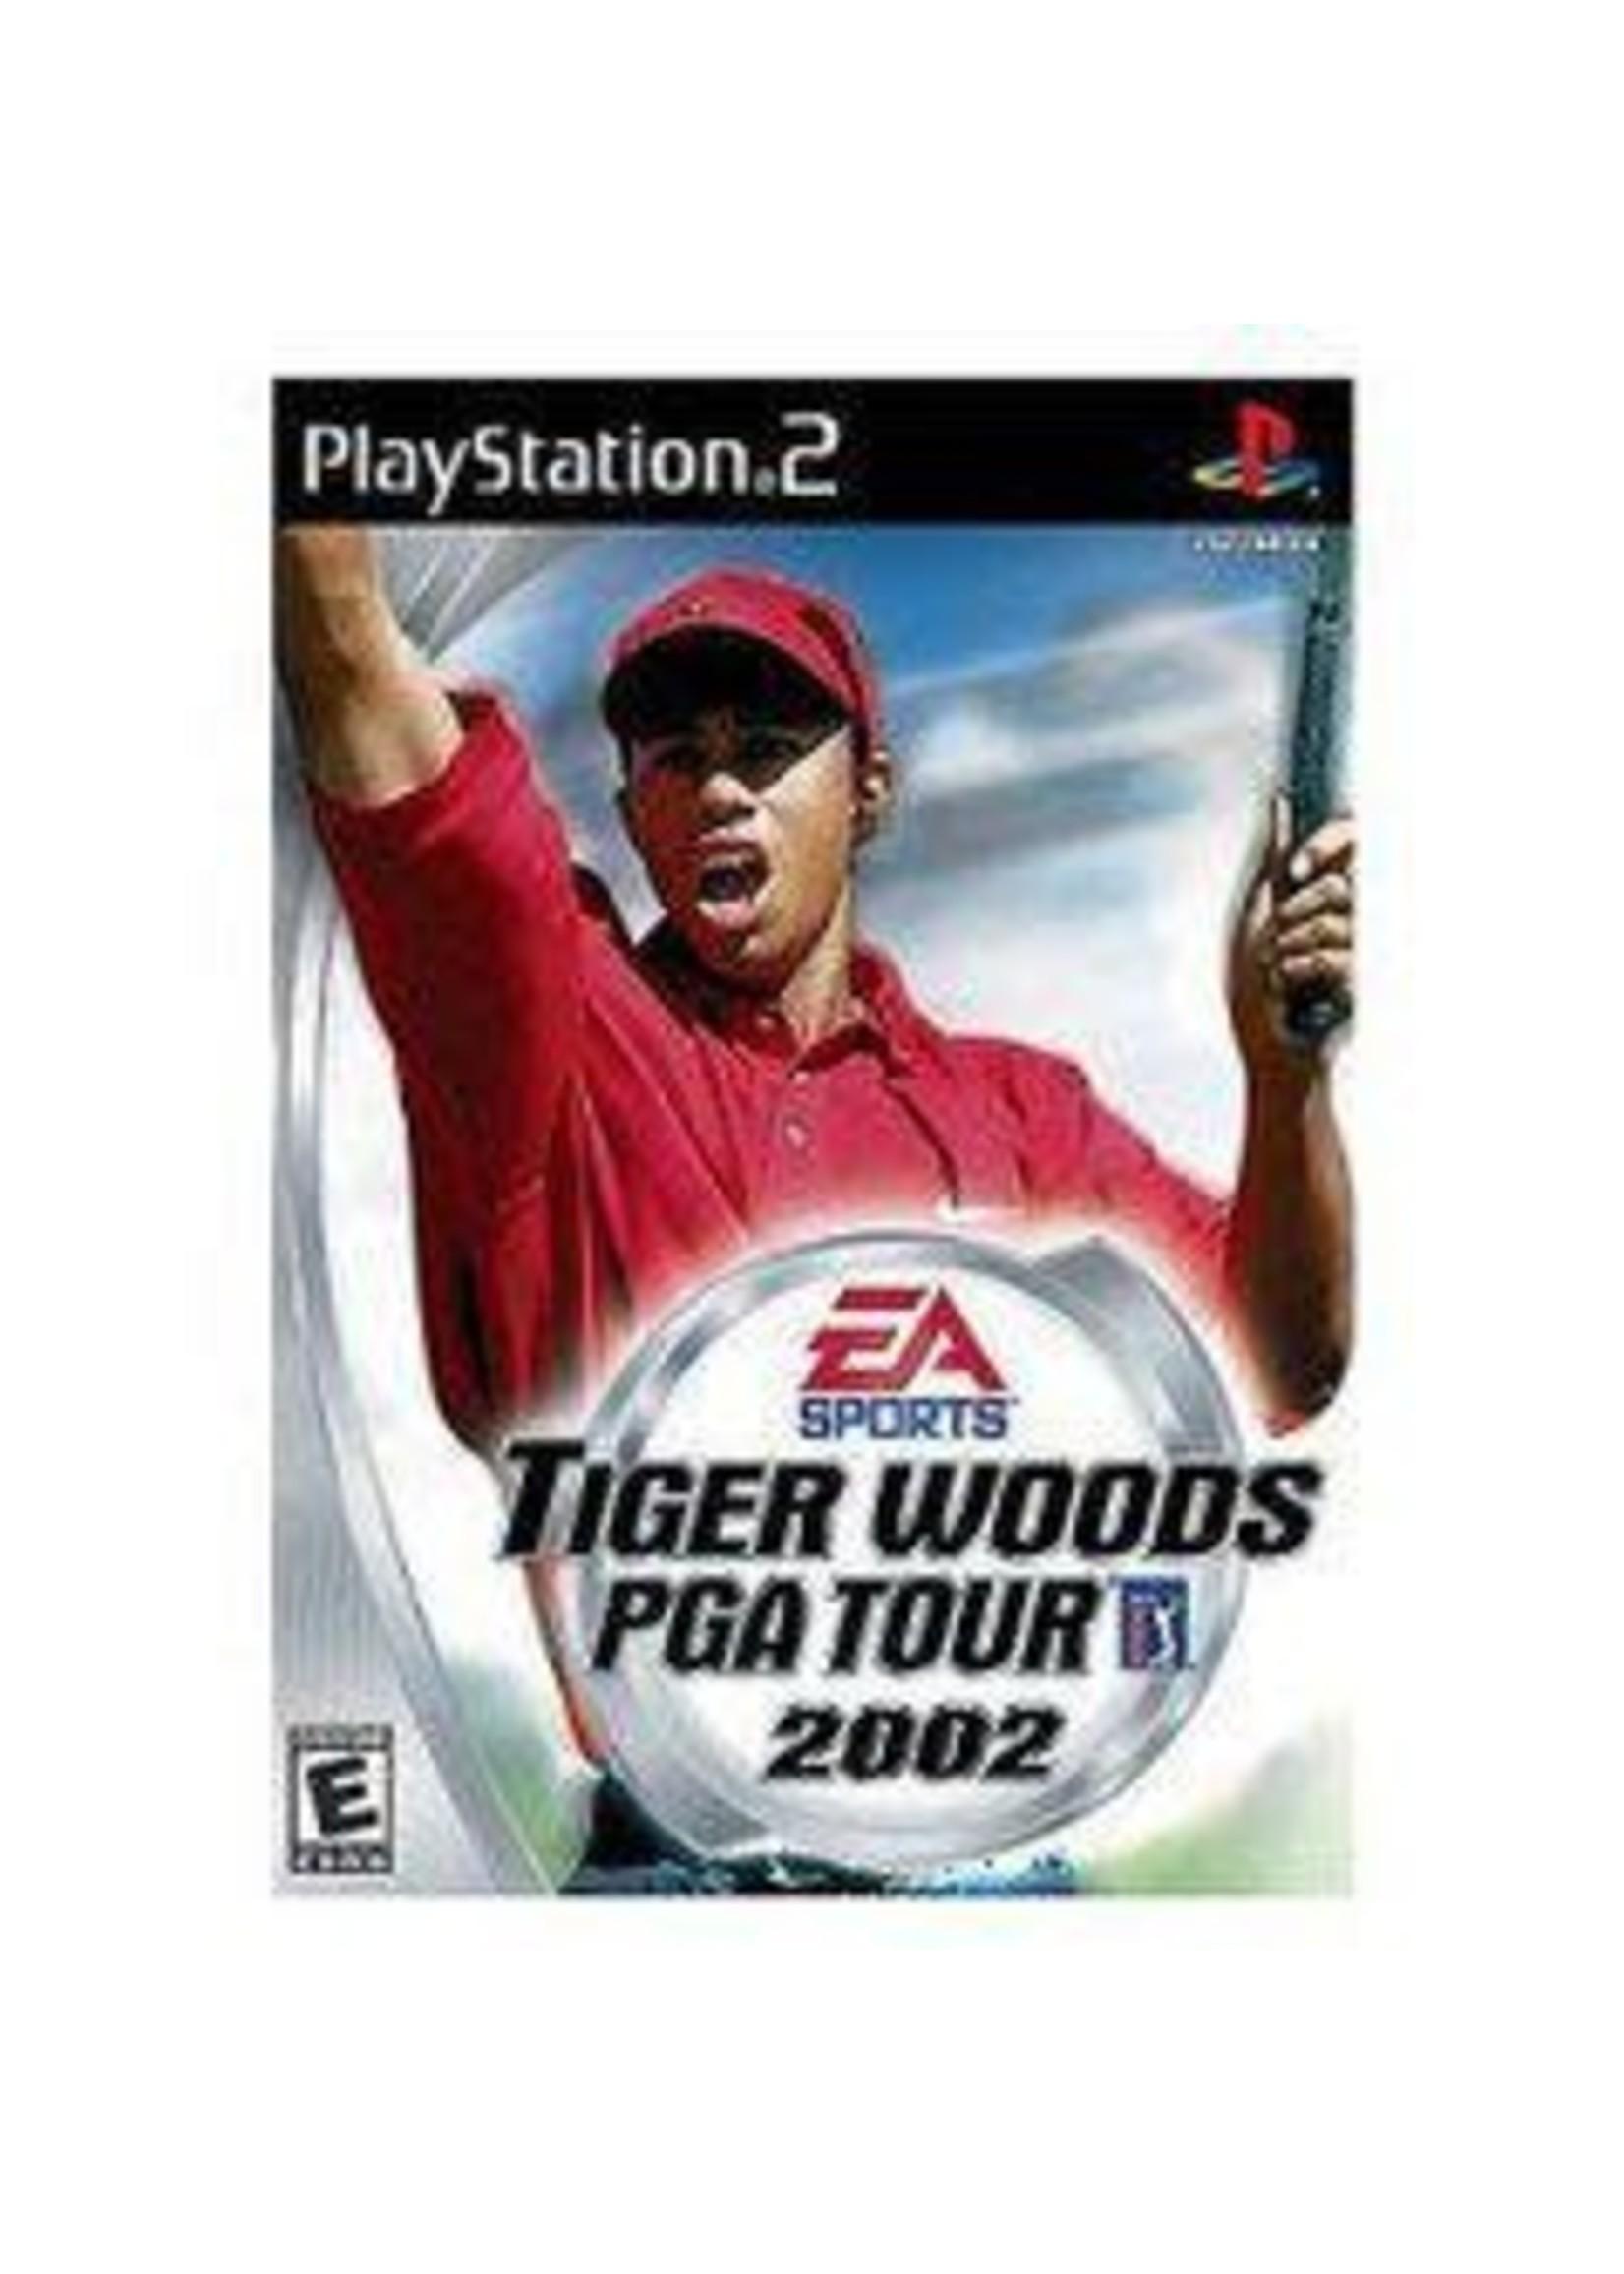 Tiger Woods 2002 Playstation 2